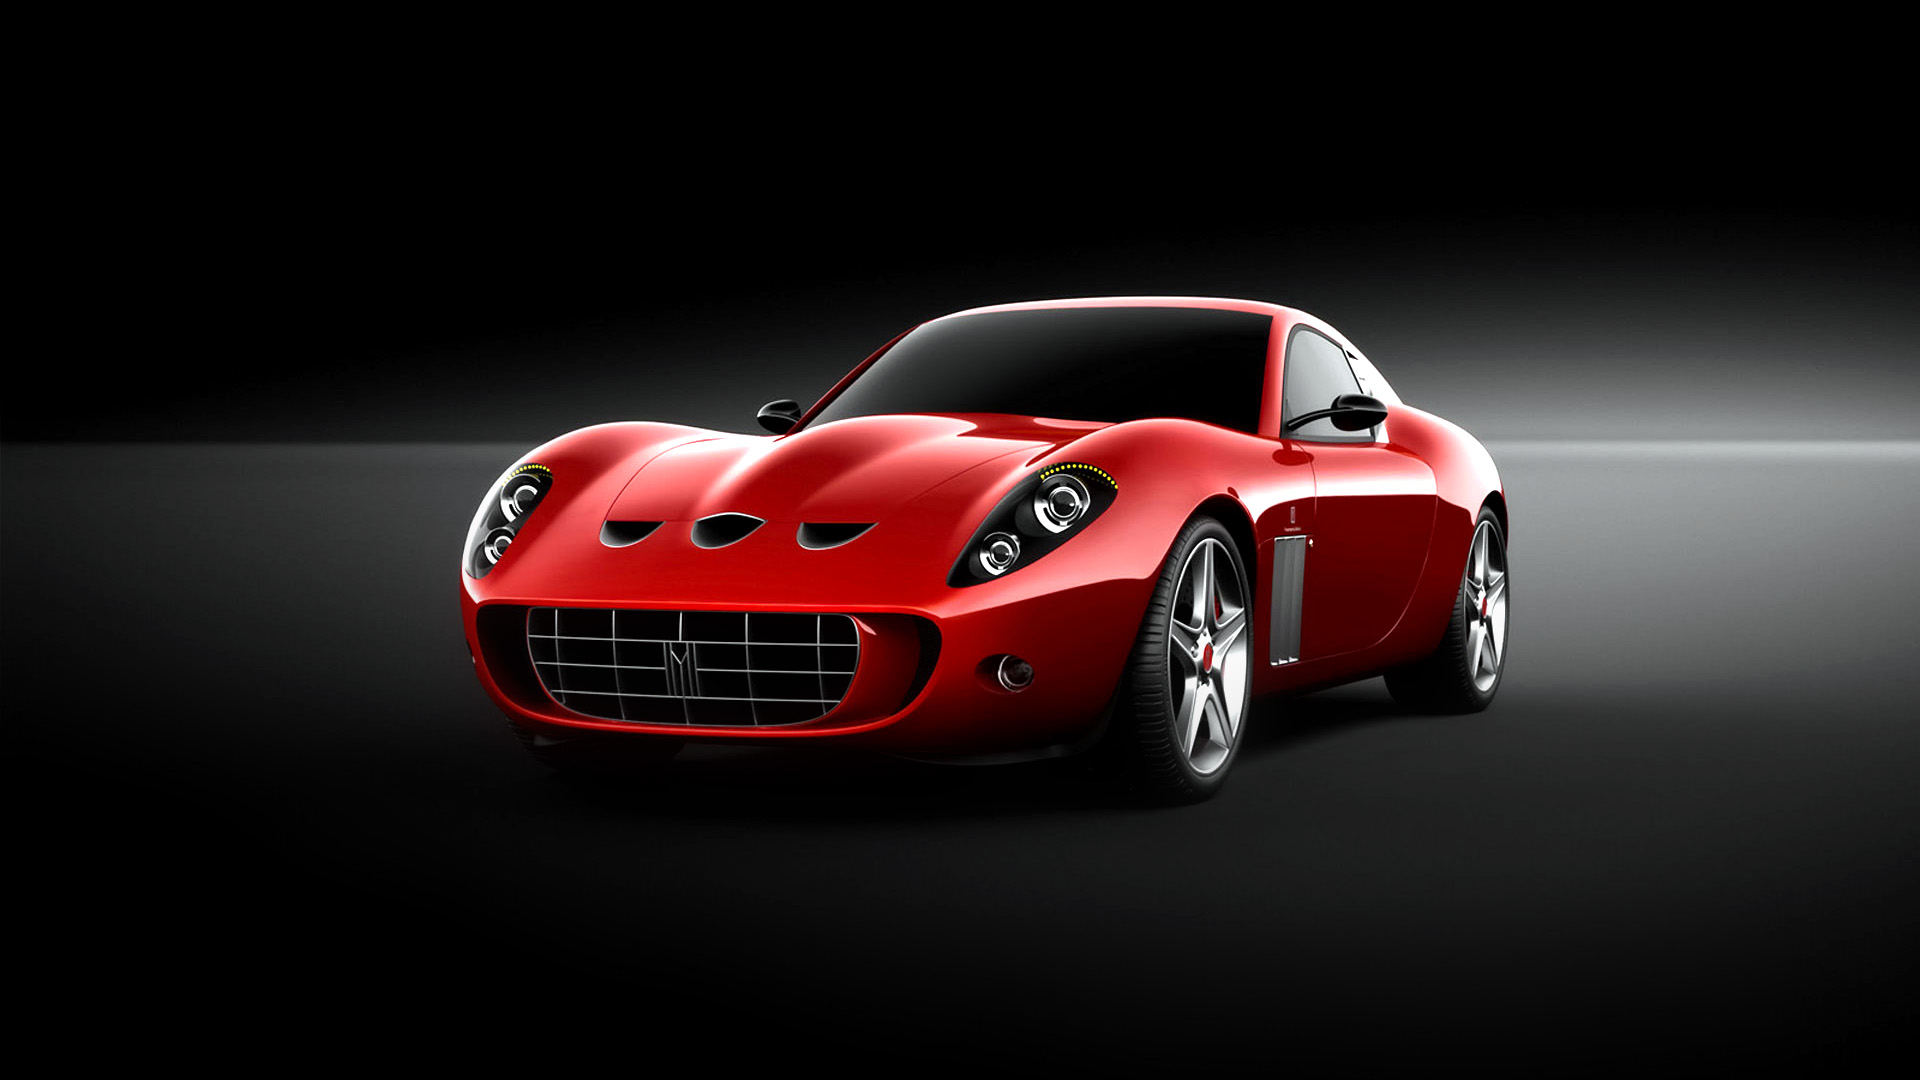 2007 Ferrari 599 GTO Vandenbrink